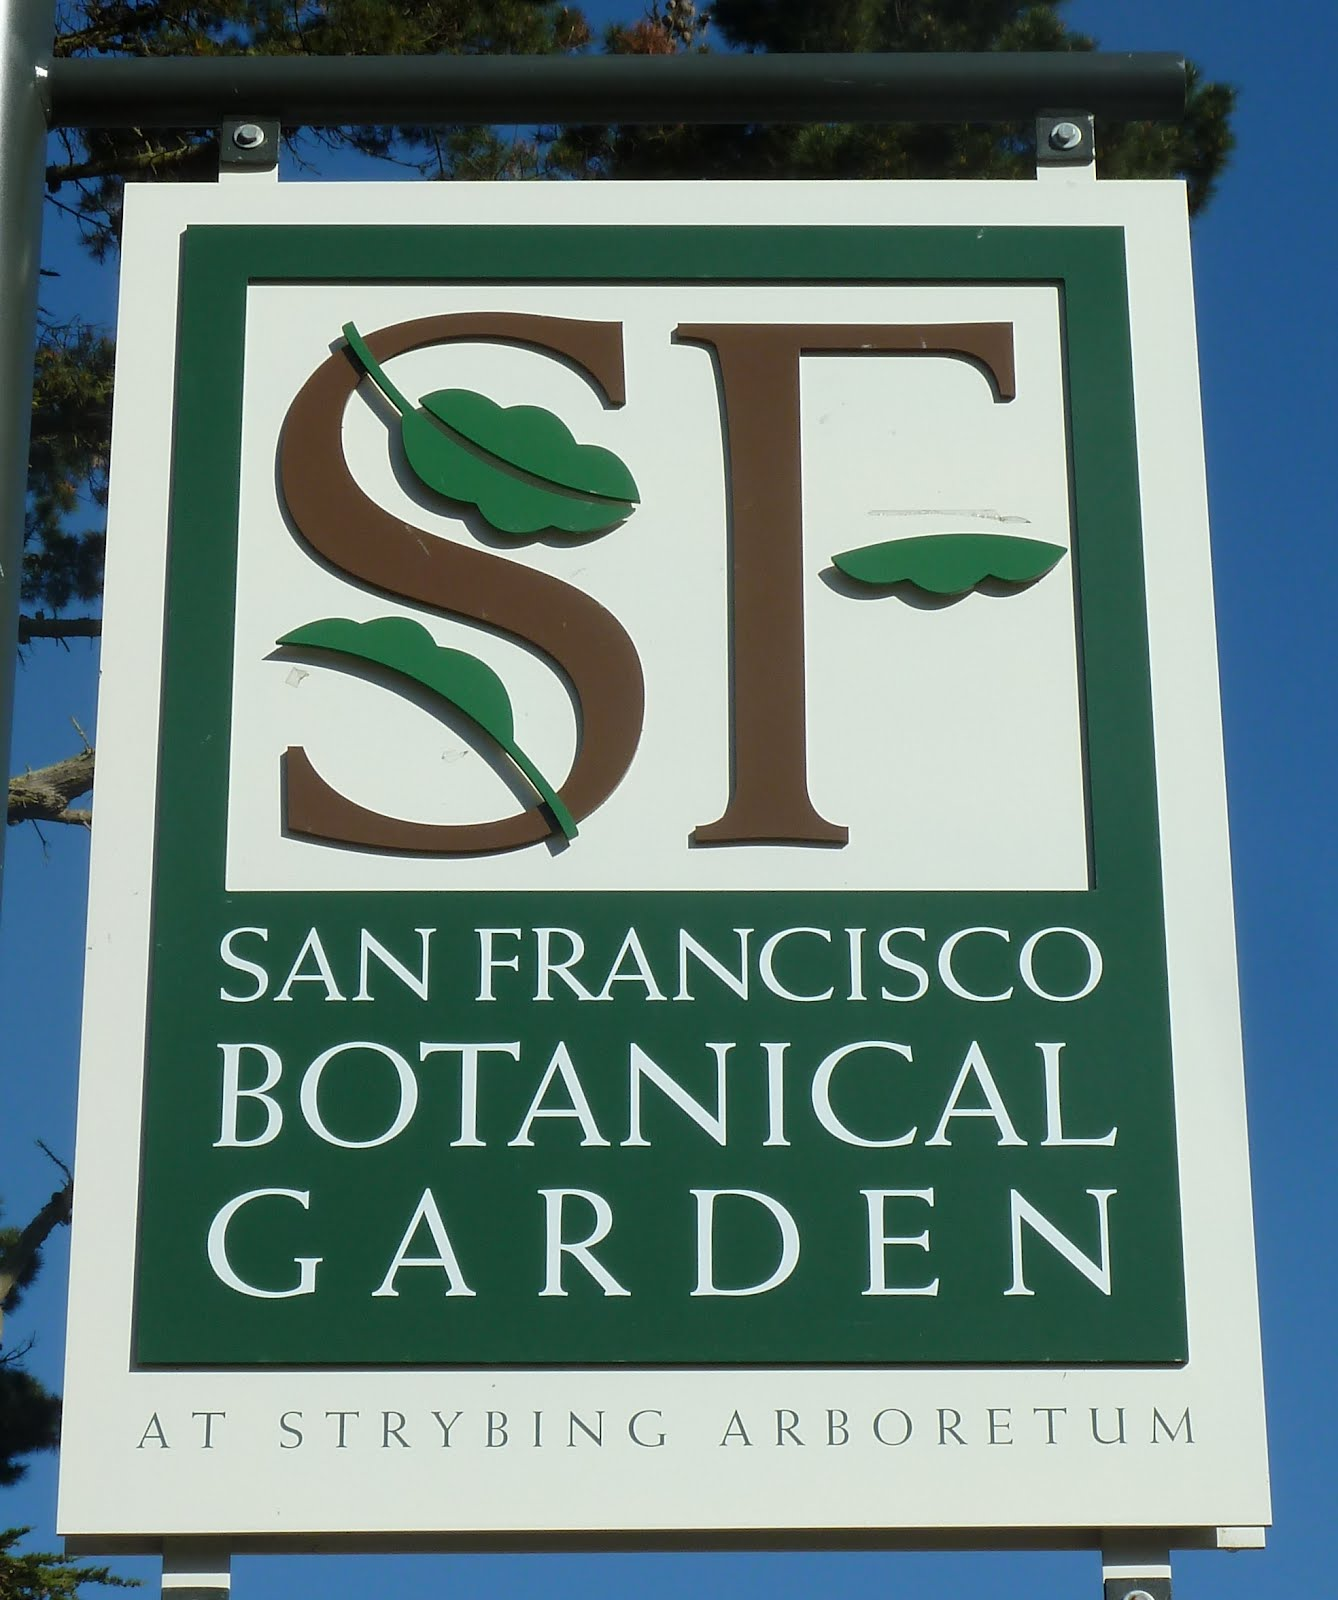 San Francisco Botanical Garden At Strybing Arboretum March 4 2012 Mani Verde Green Hands By